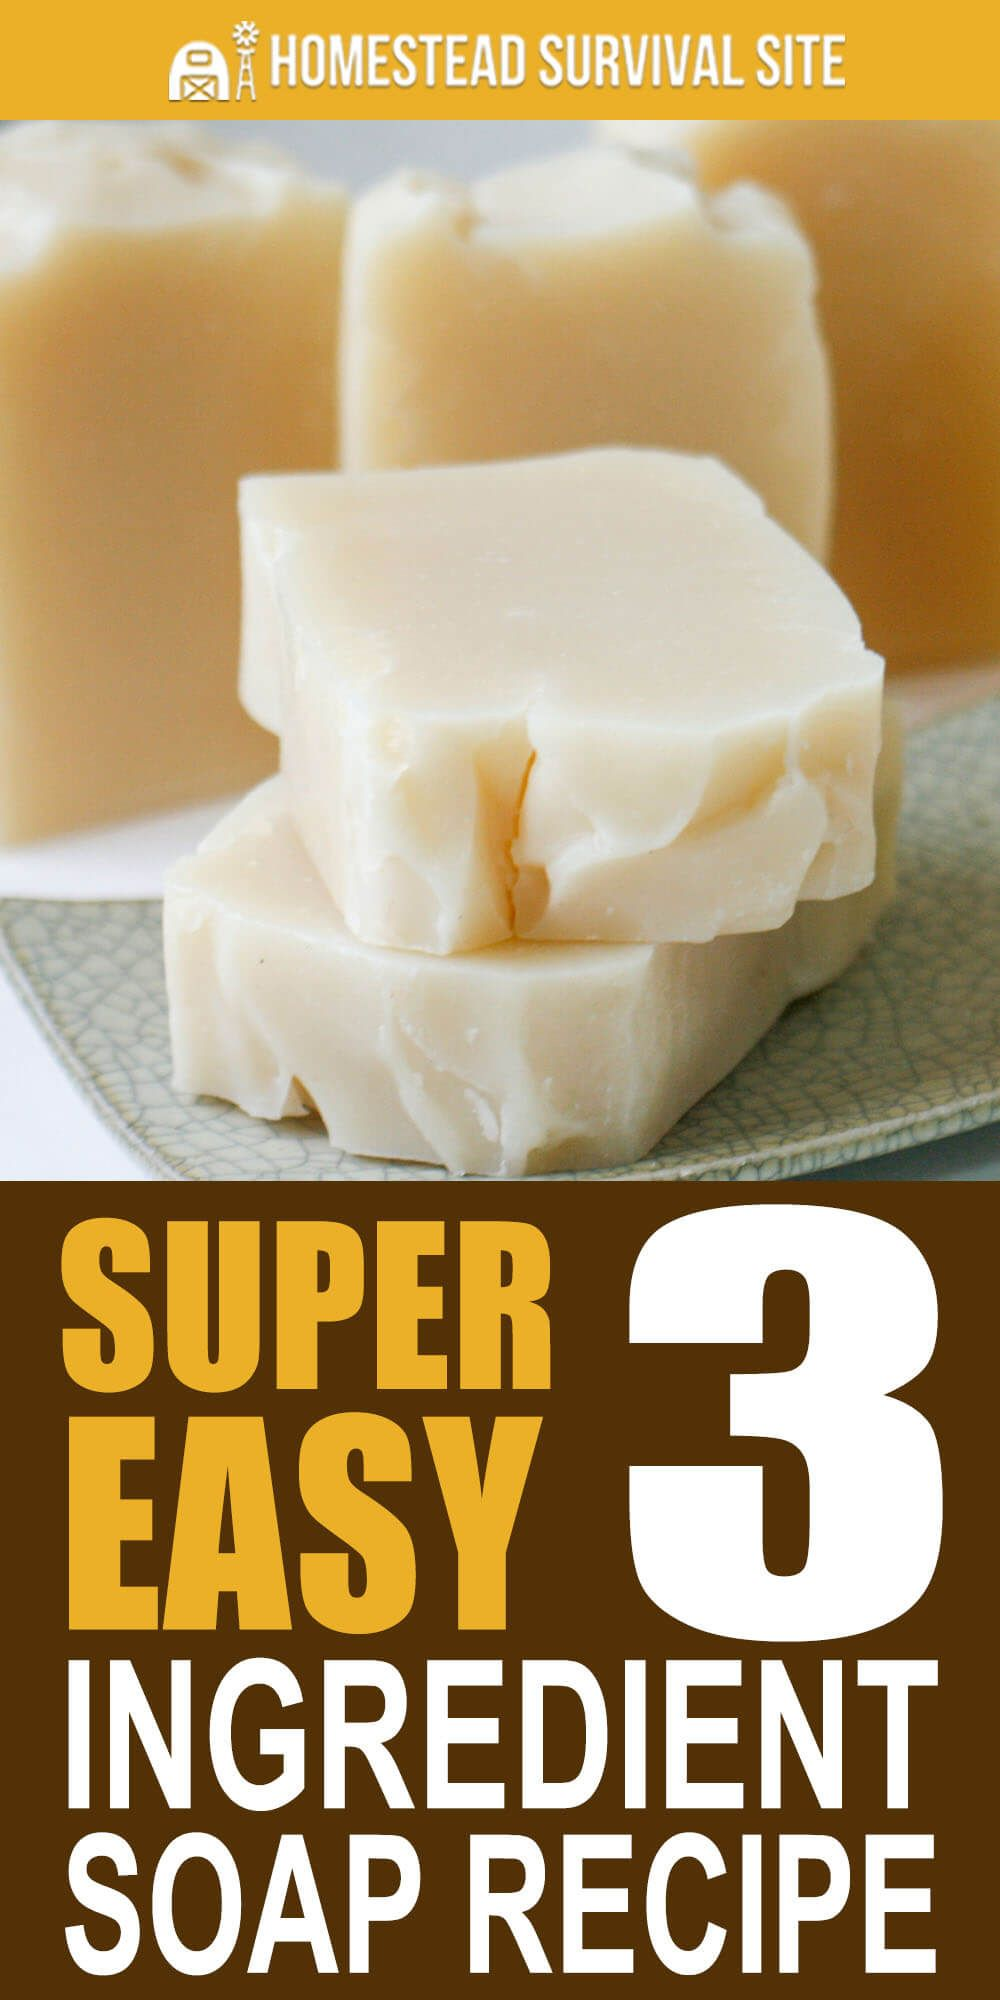 Super Easy 3 Ingredient Soap Recipe Homestead Survival Site Easy Soap Recipes Soap Recipes Cold Process Soap Recipes